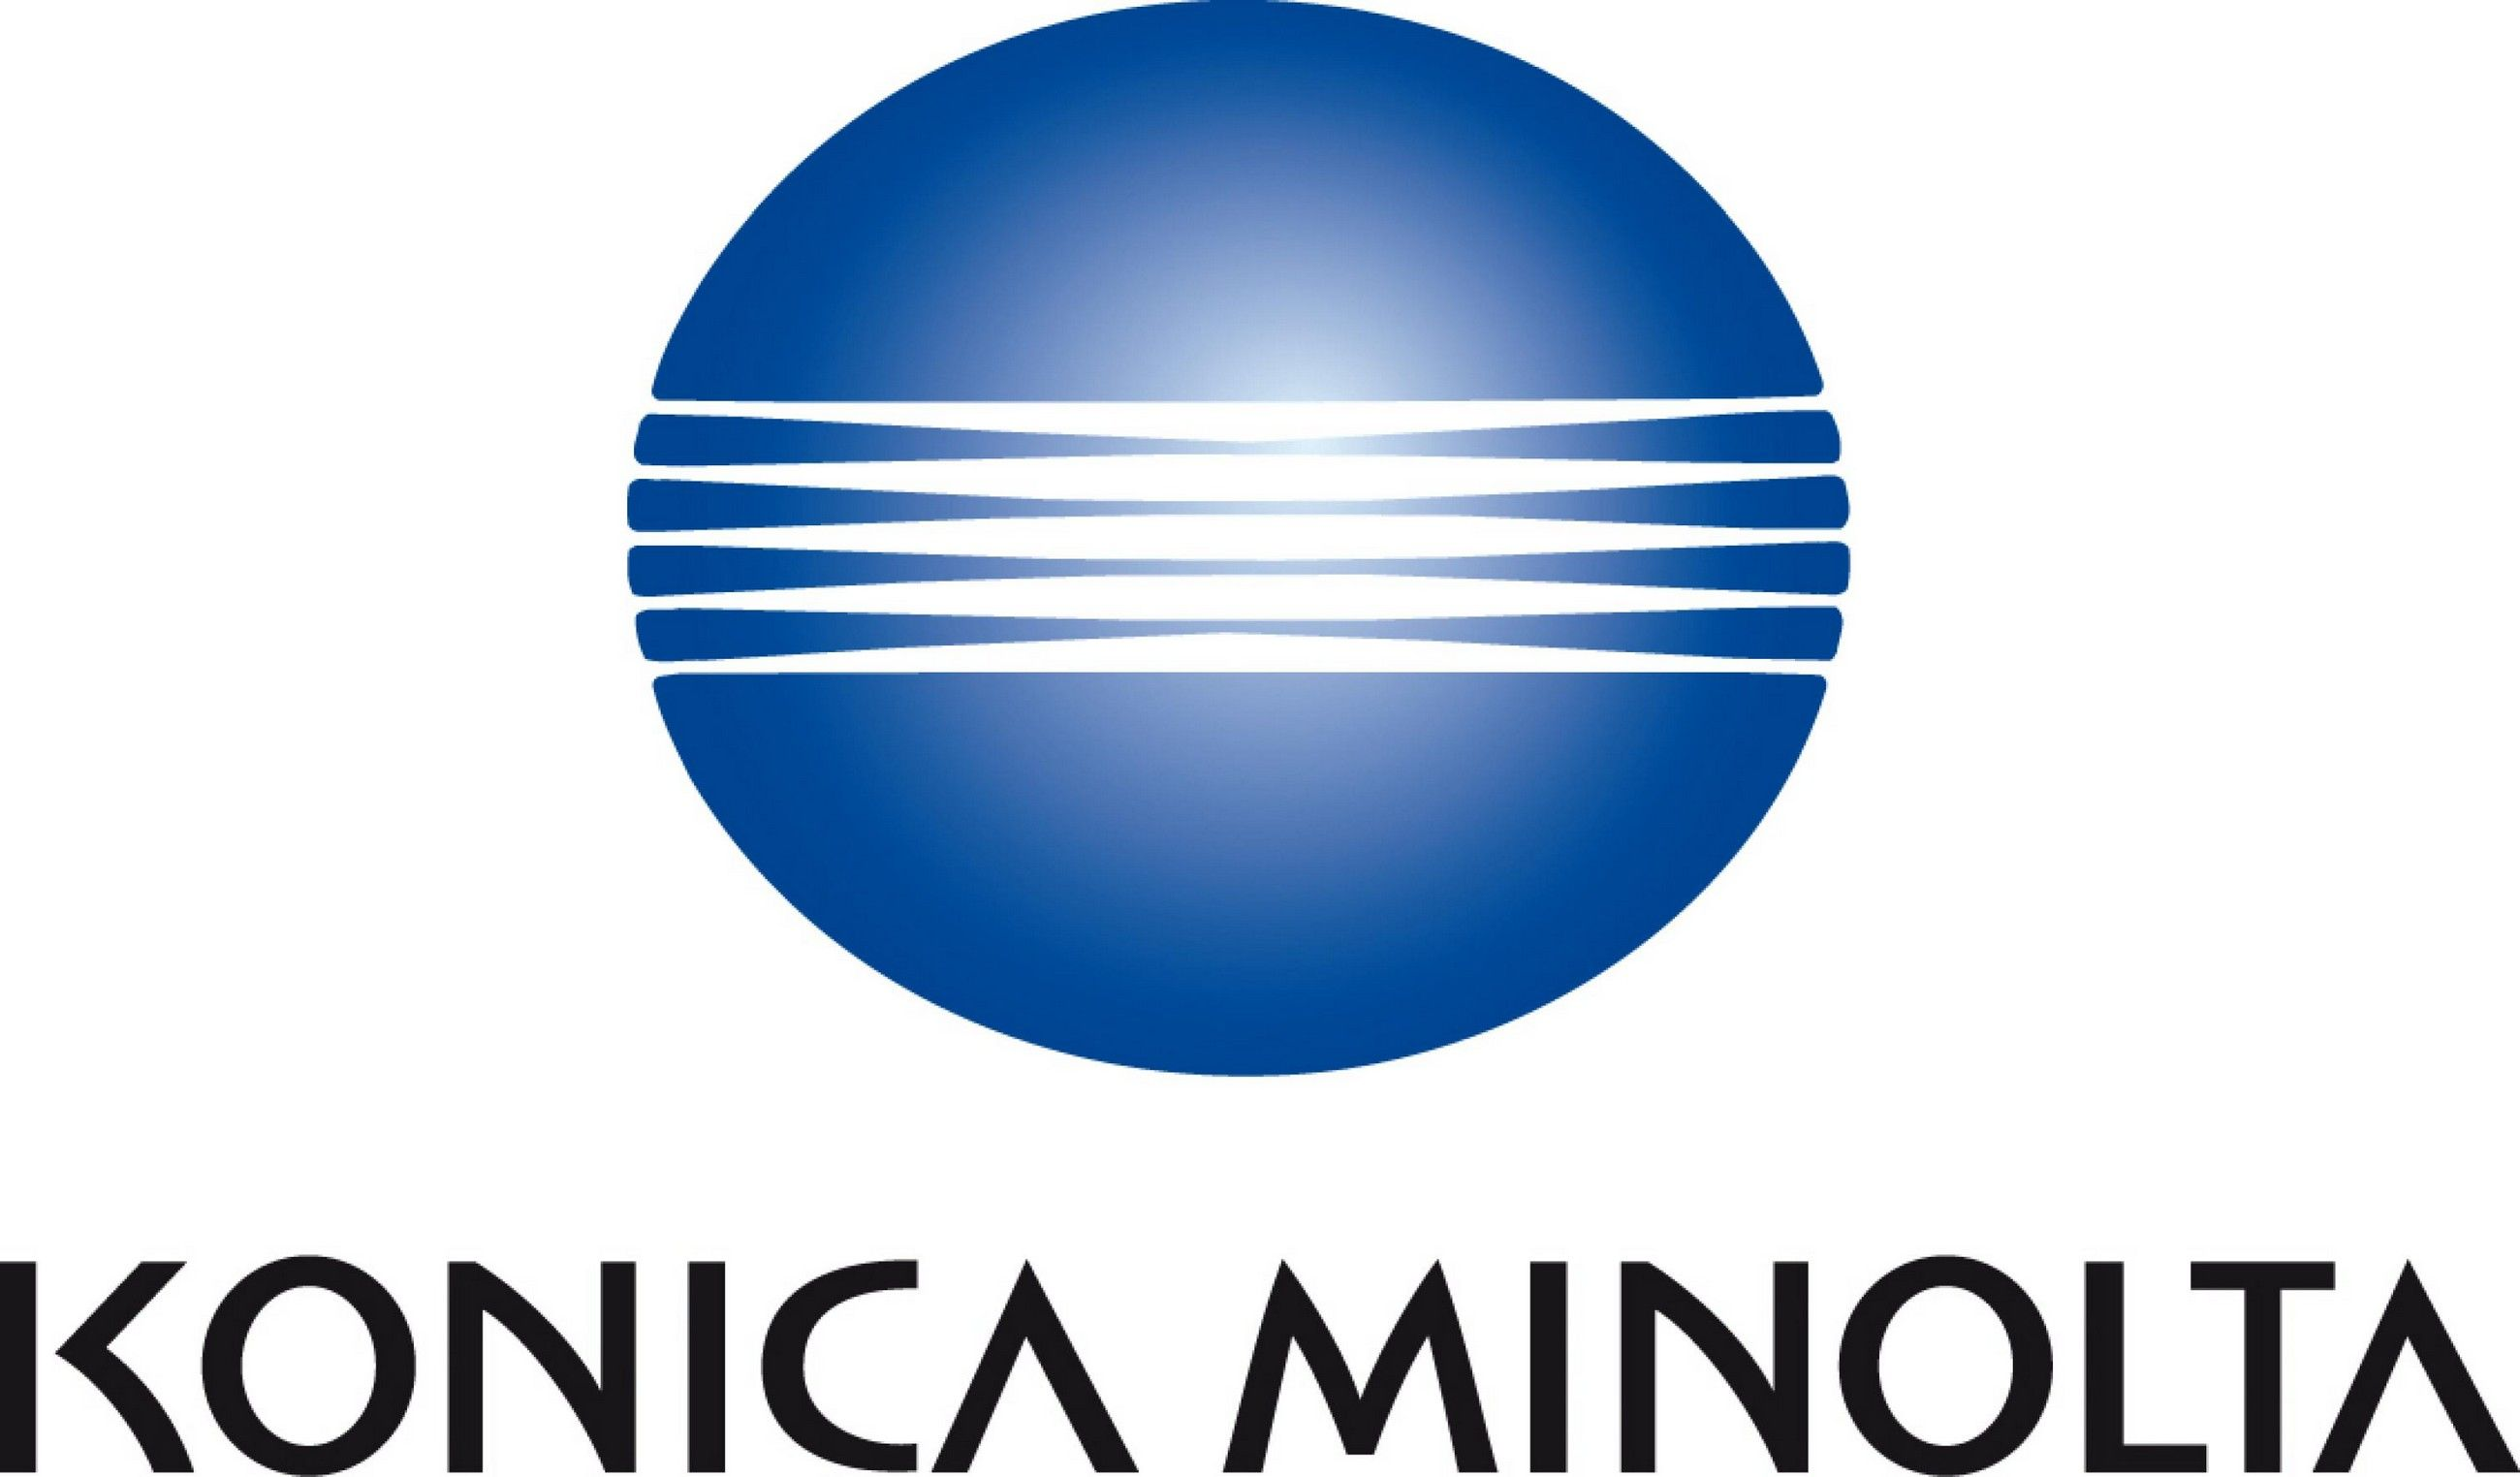 Konica Minolta Logo [AIPDF] Konica minolta, Monitor for